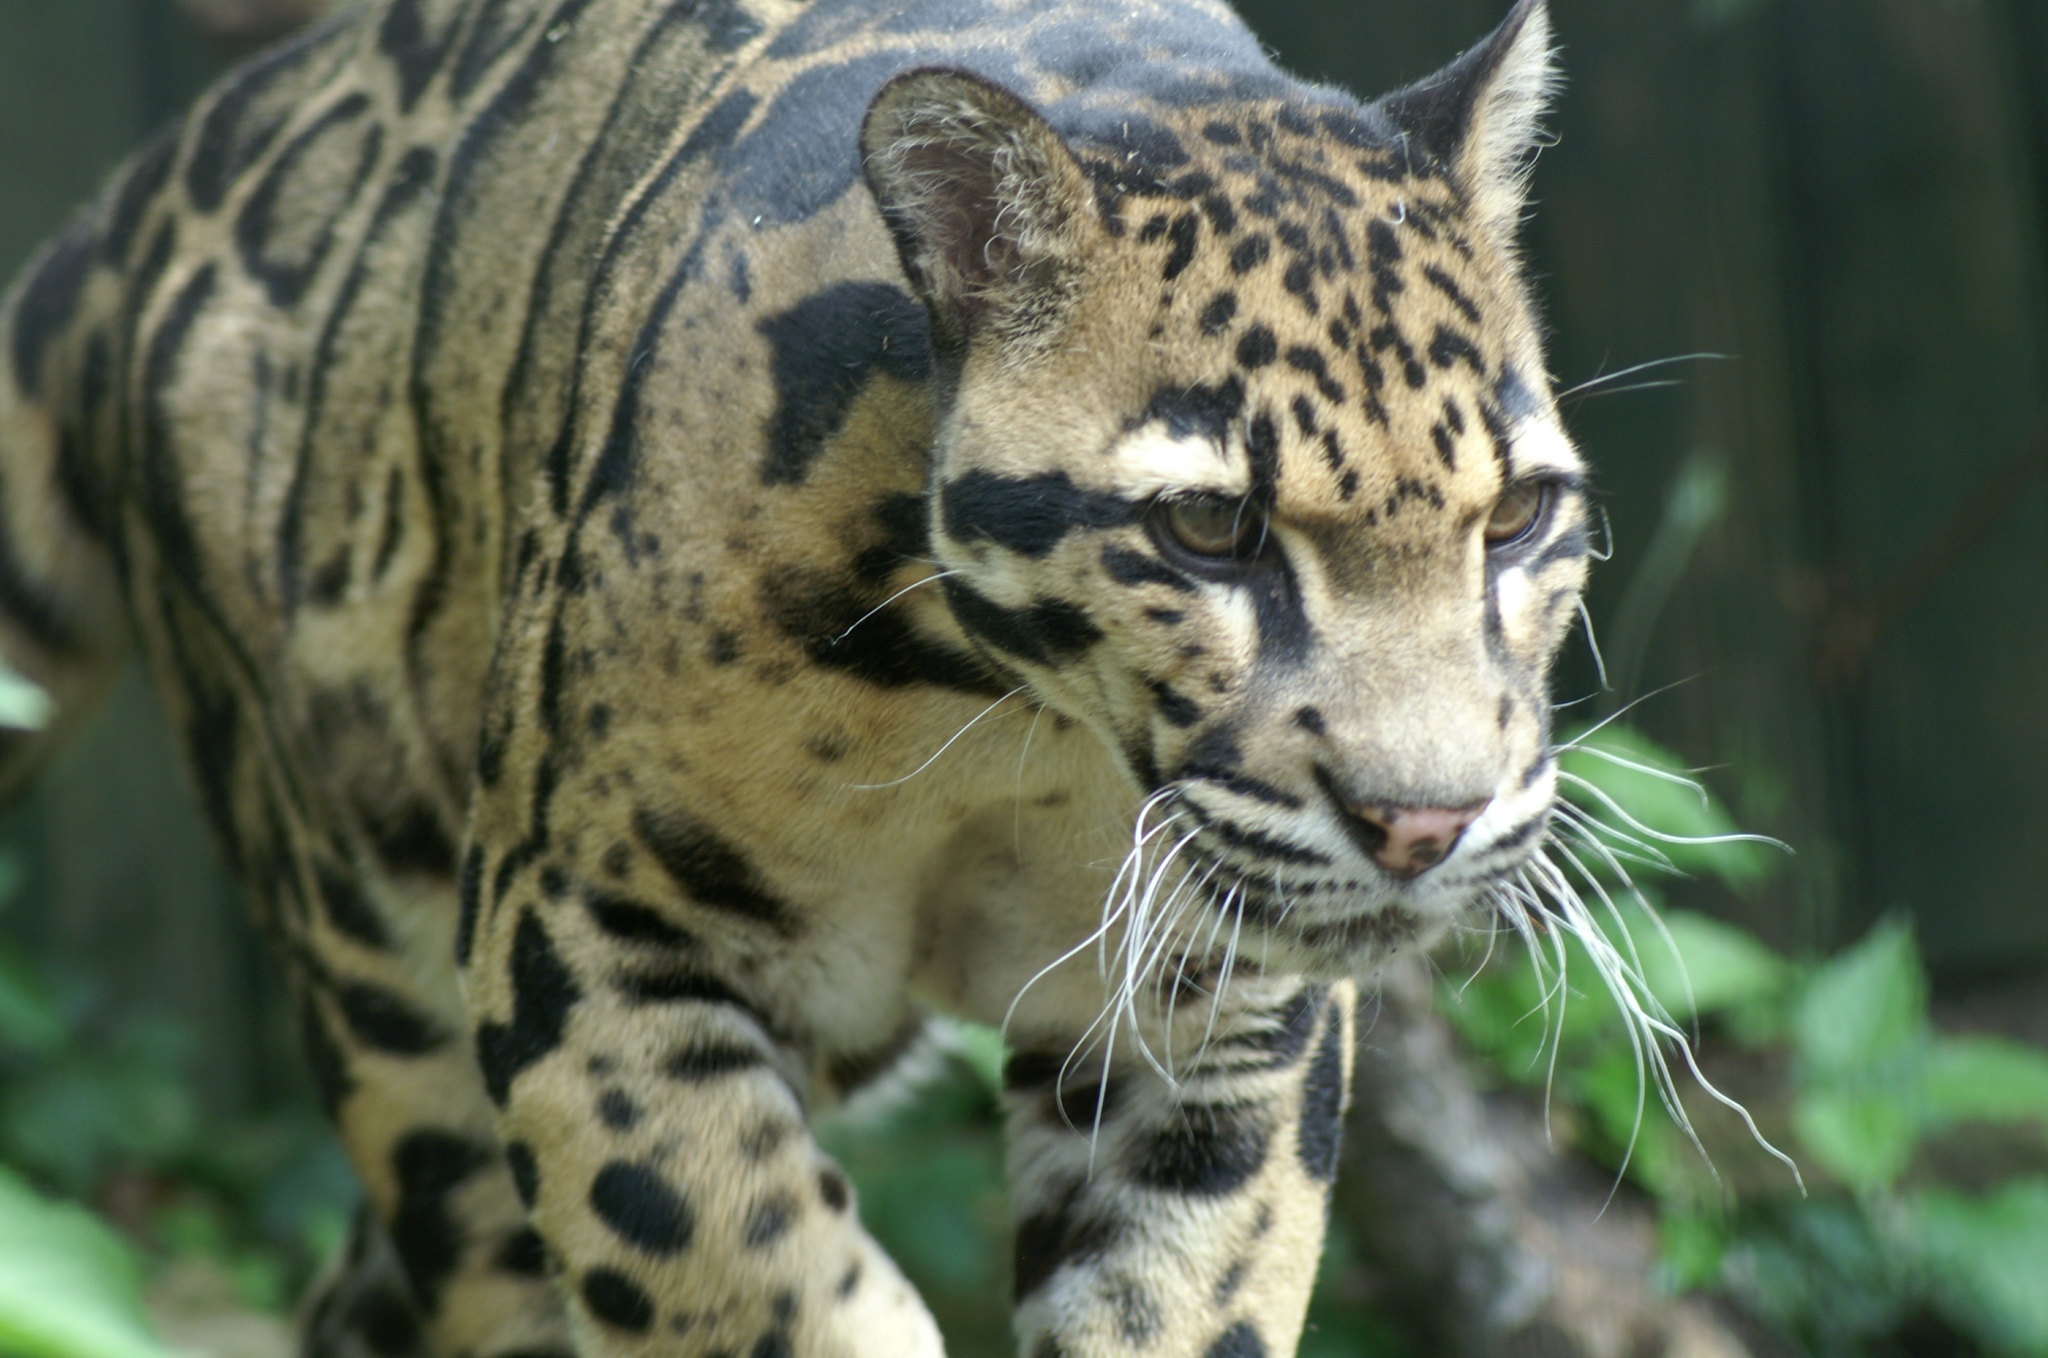 wild animal, clouded leopard